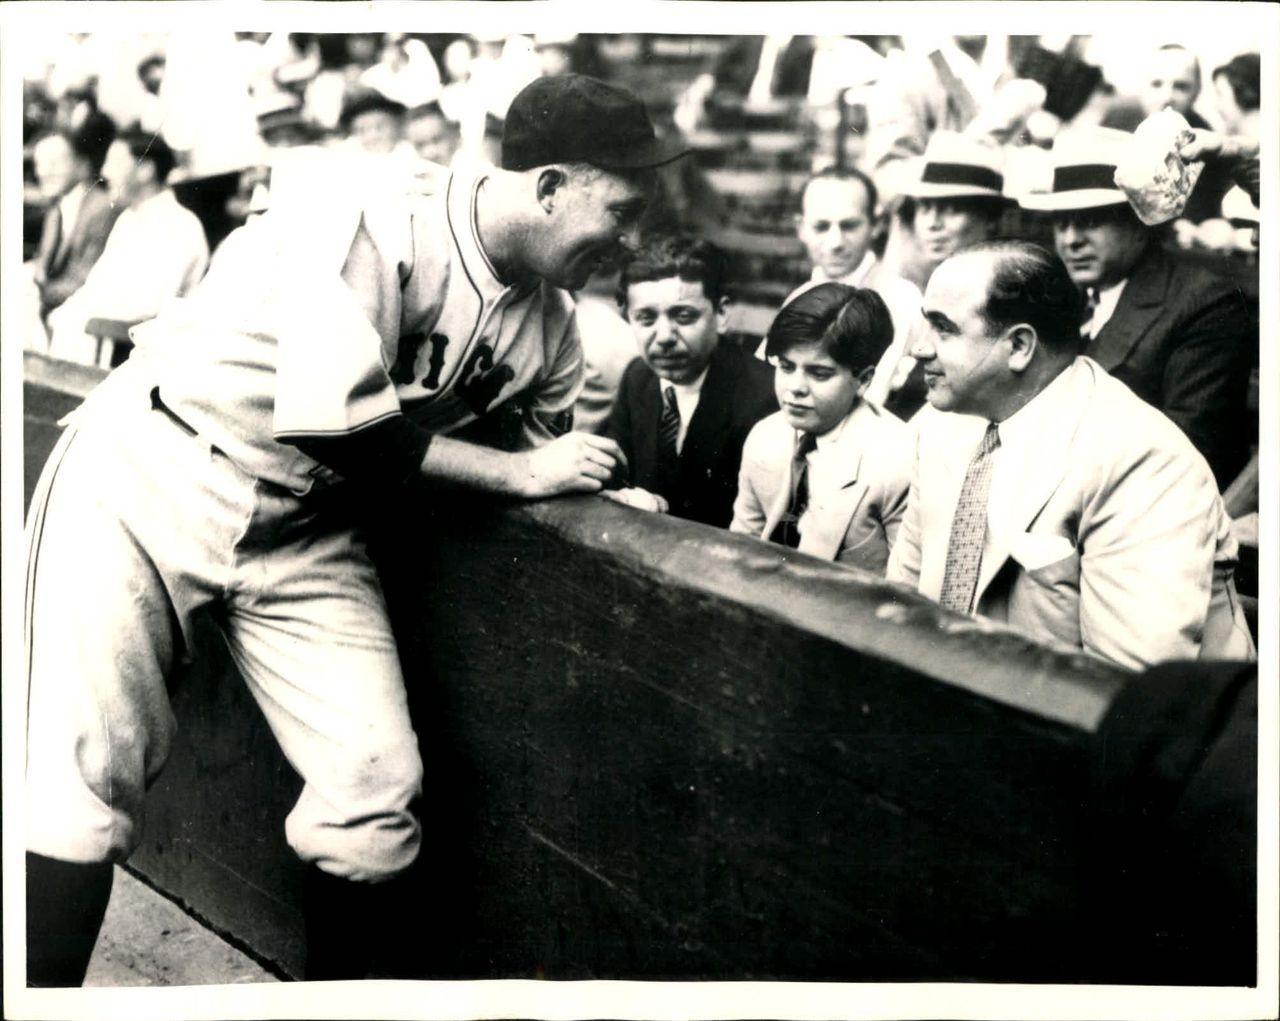 9a384863636 Gabby Hartnett of the Chicago Cubs autographs a ball for Al Capone s son  Sonny